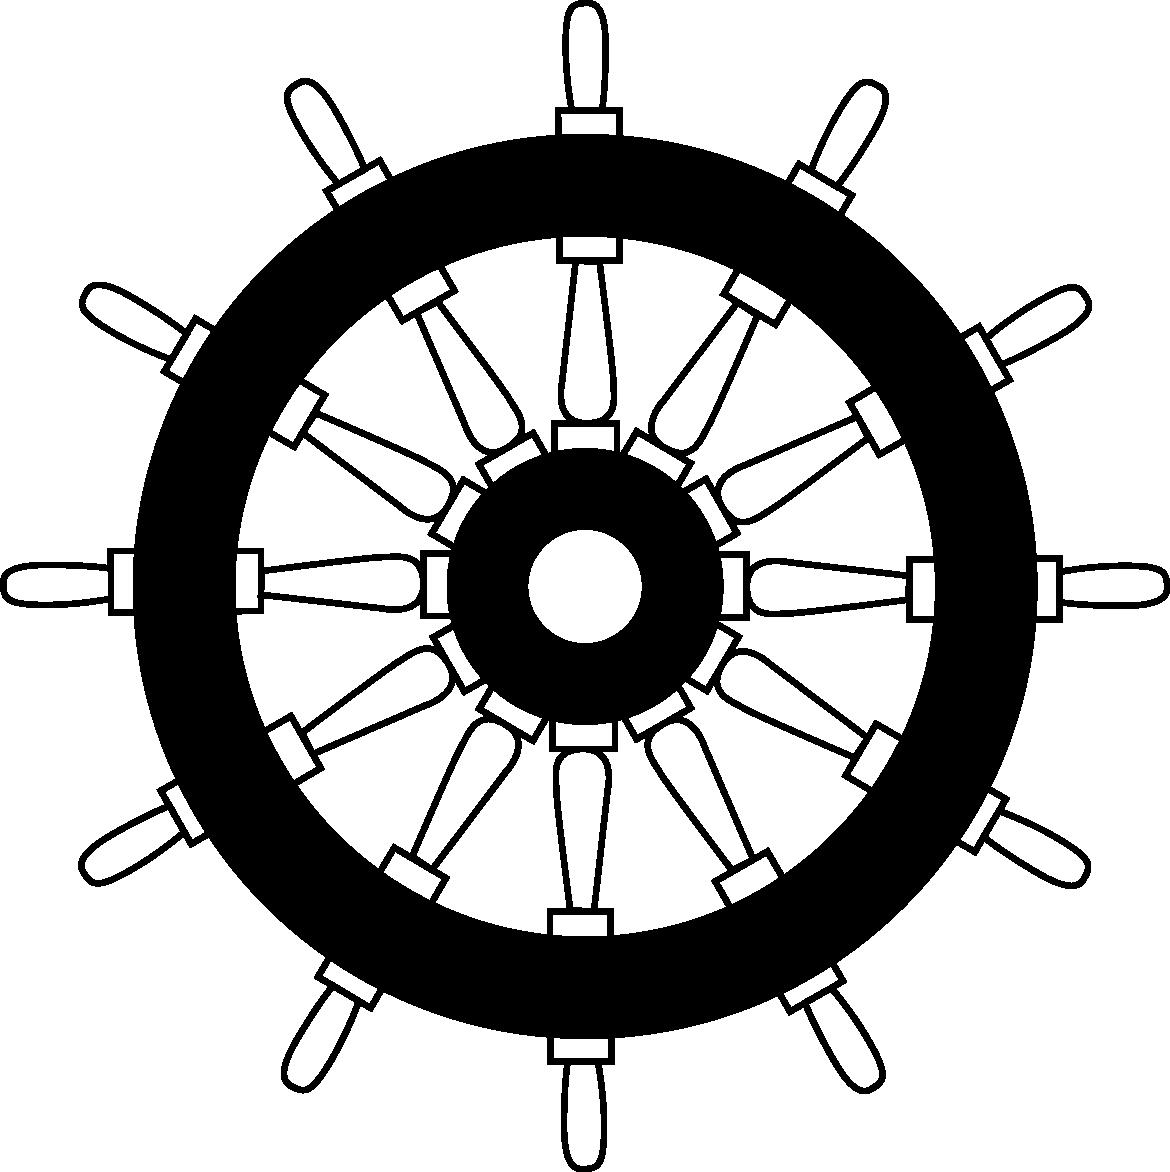 Wheelmark / USCG